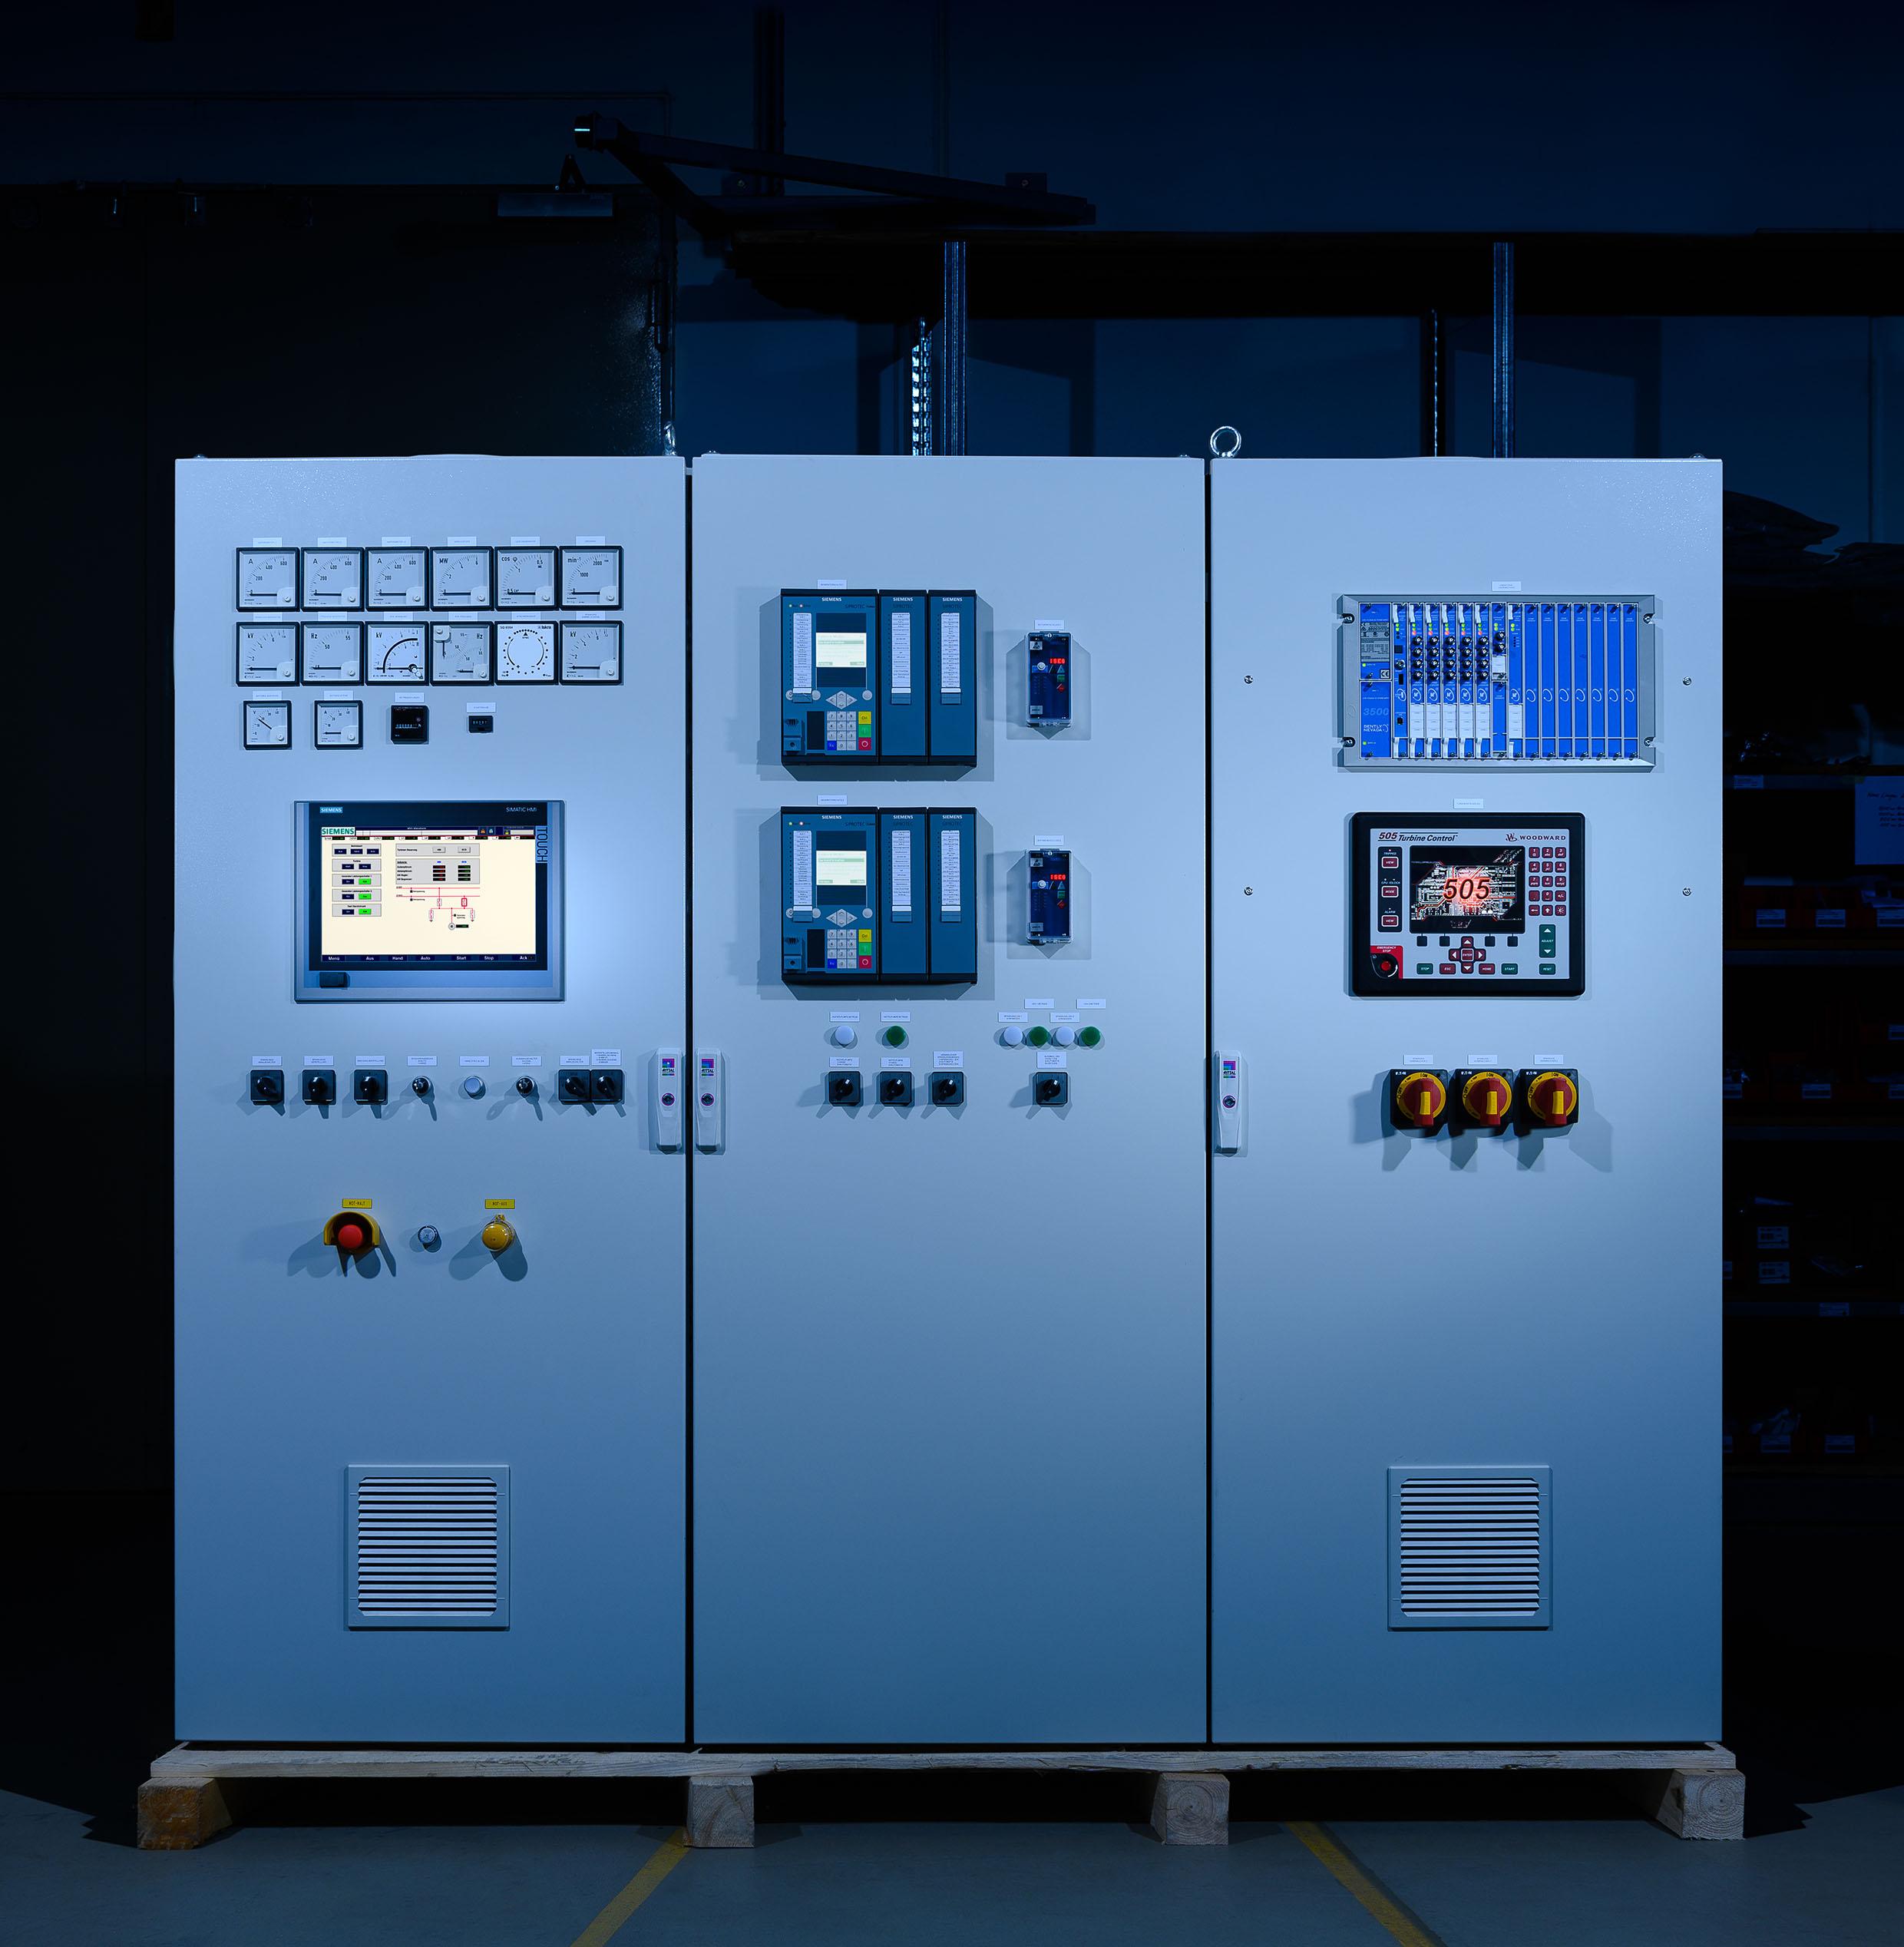 Control Cabinet Engineering at HPS Using Eplan Cogineer